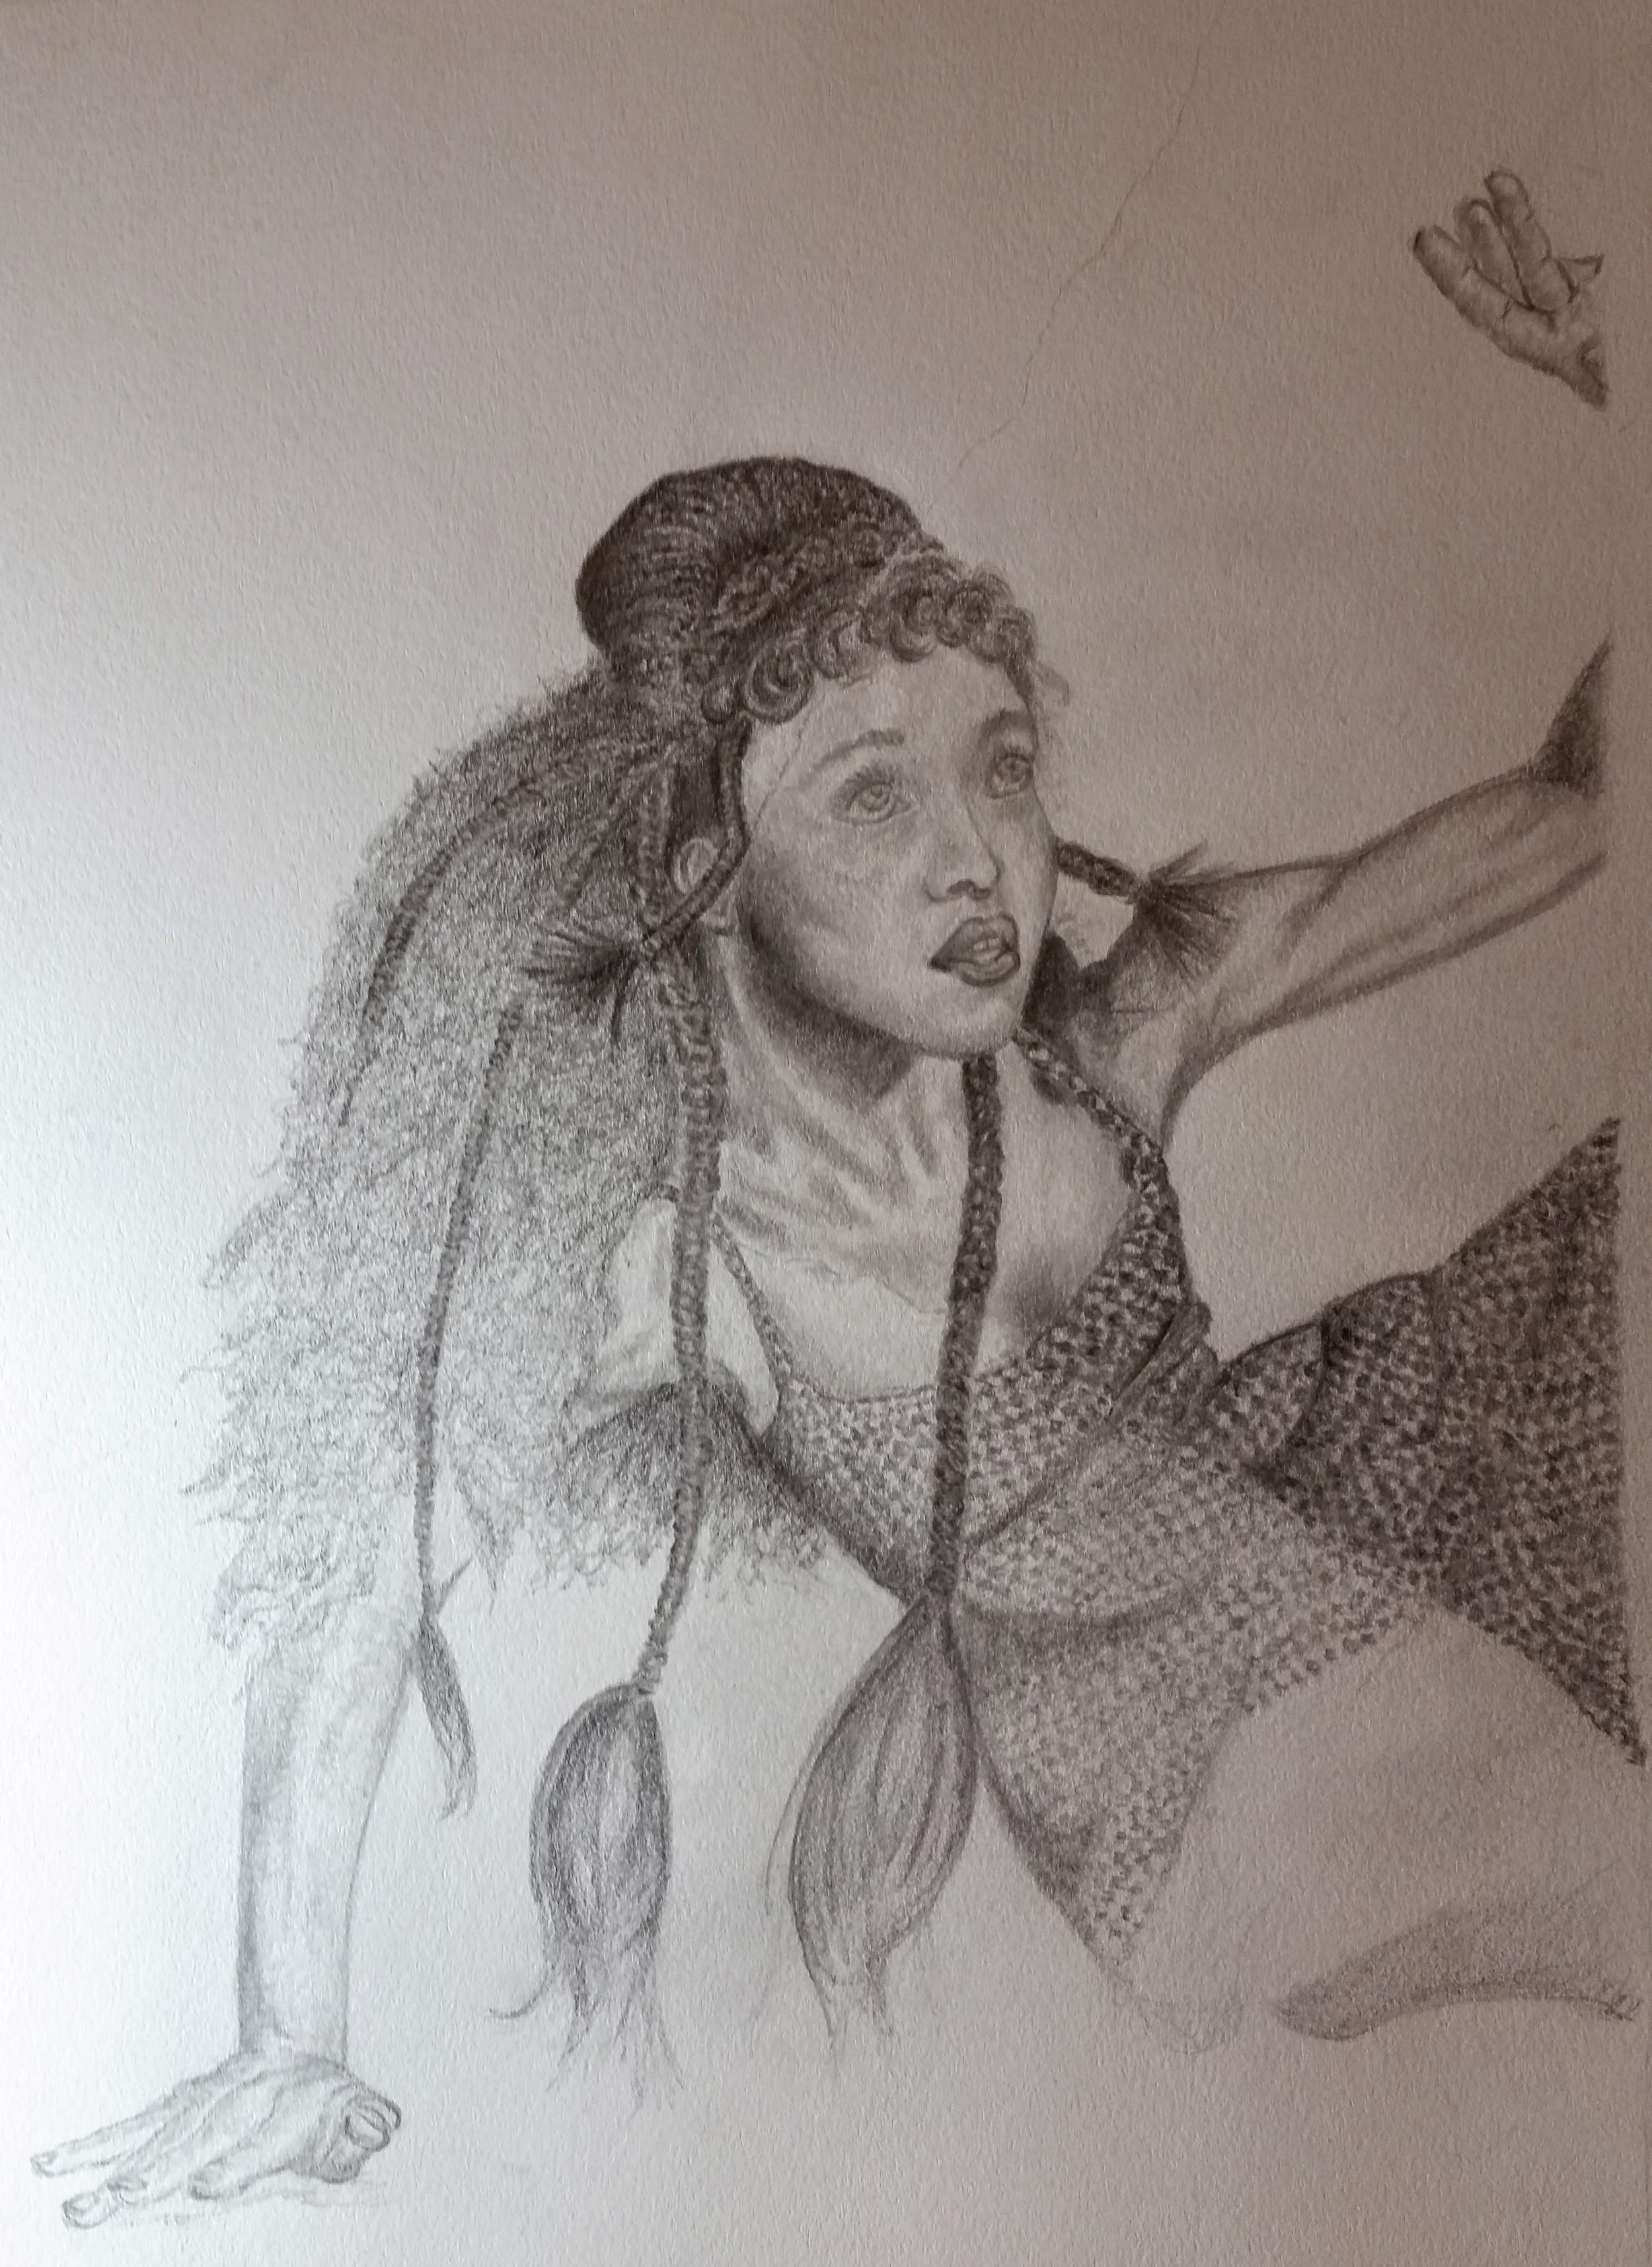 One of my works in progress.